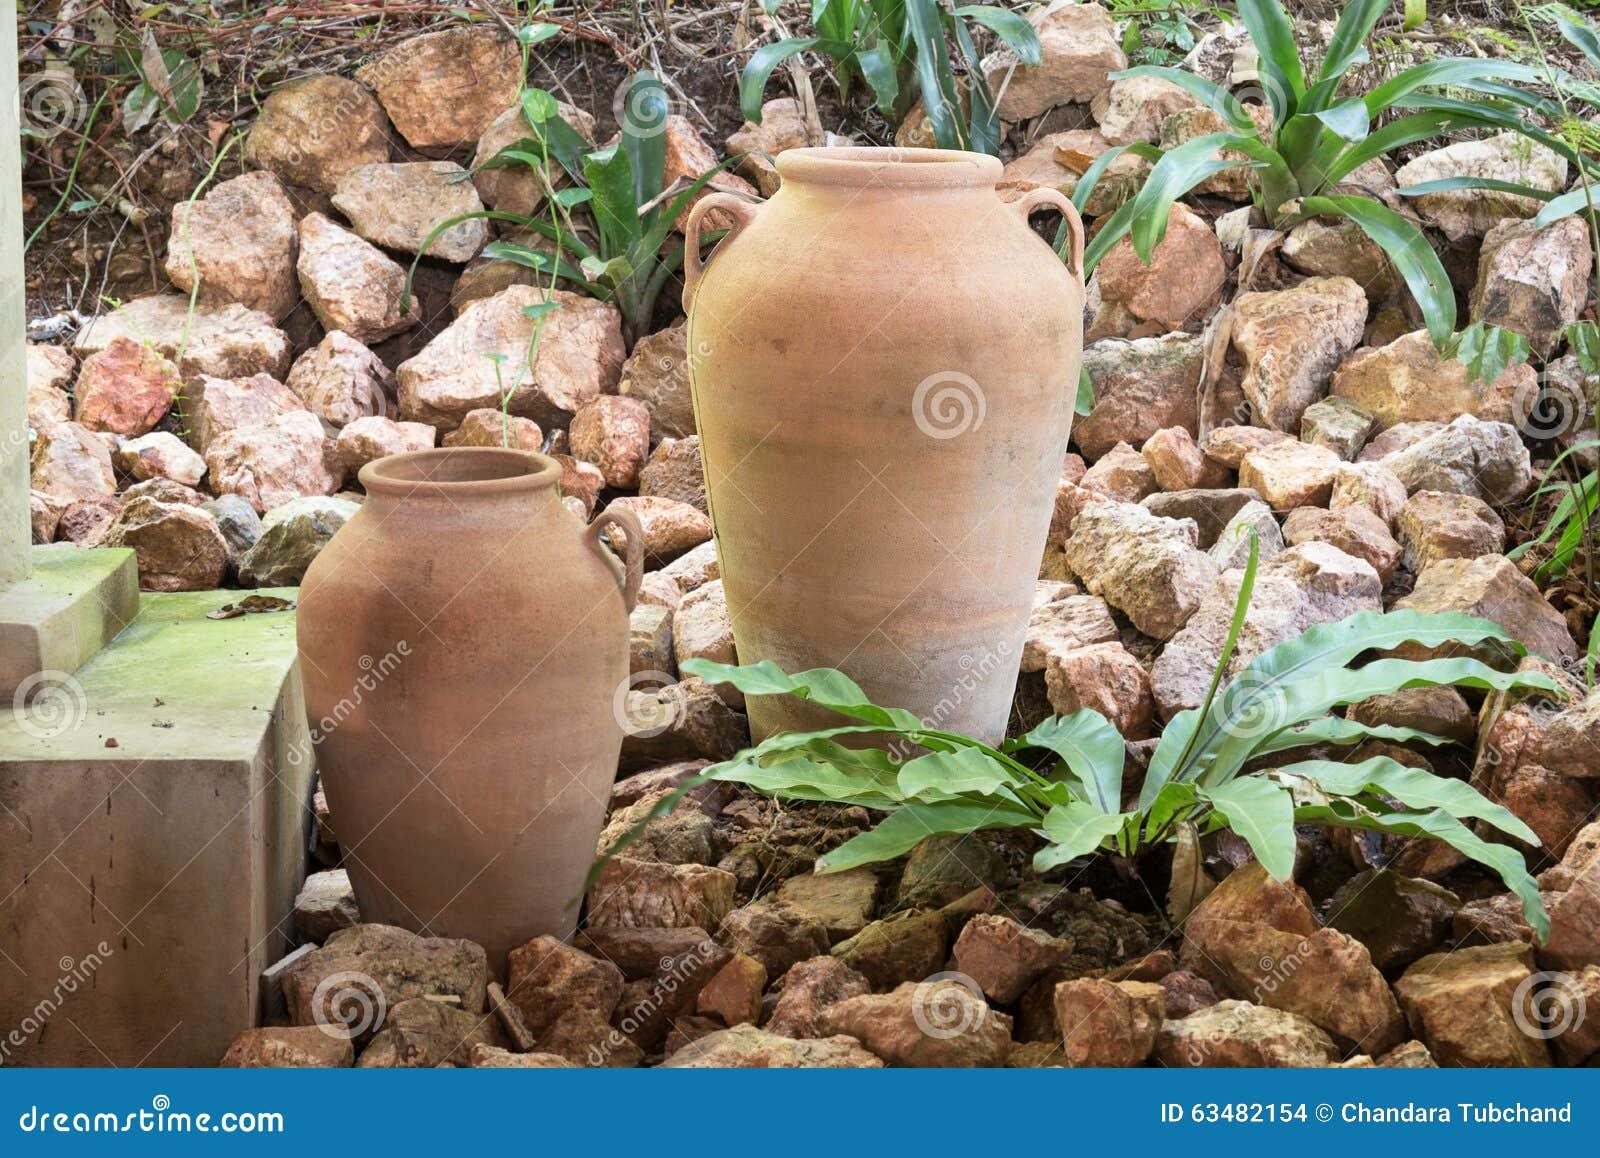 tropical garden decoration stock photo - image: 57543267